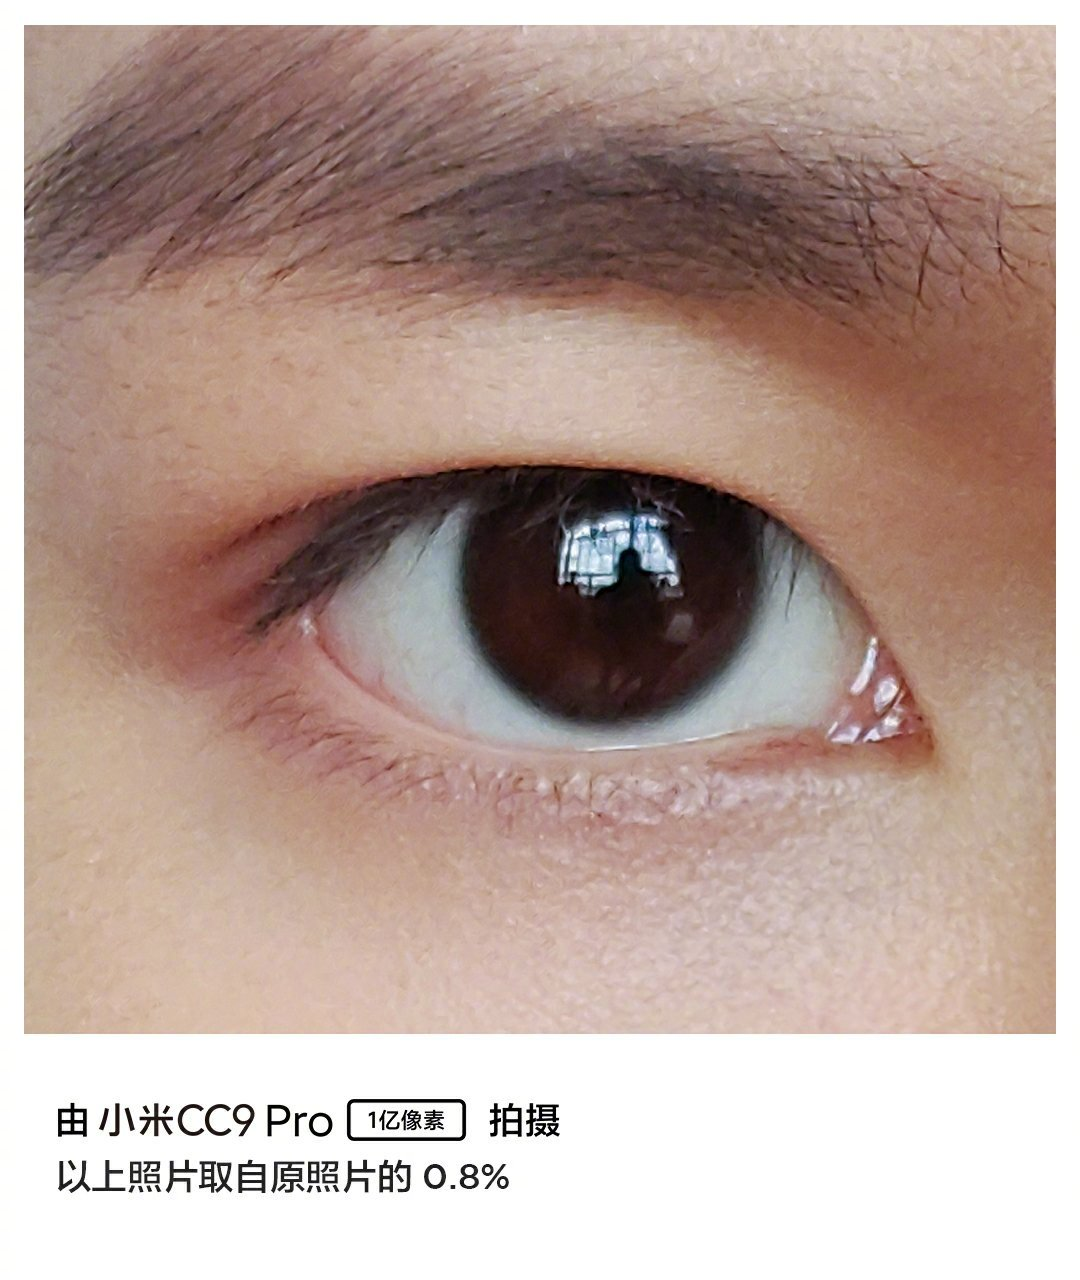 Xiaomi Mi CC9 Pro-sample